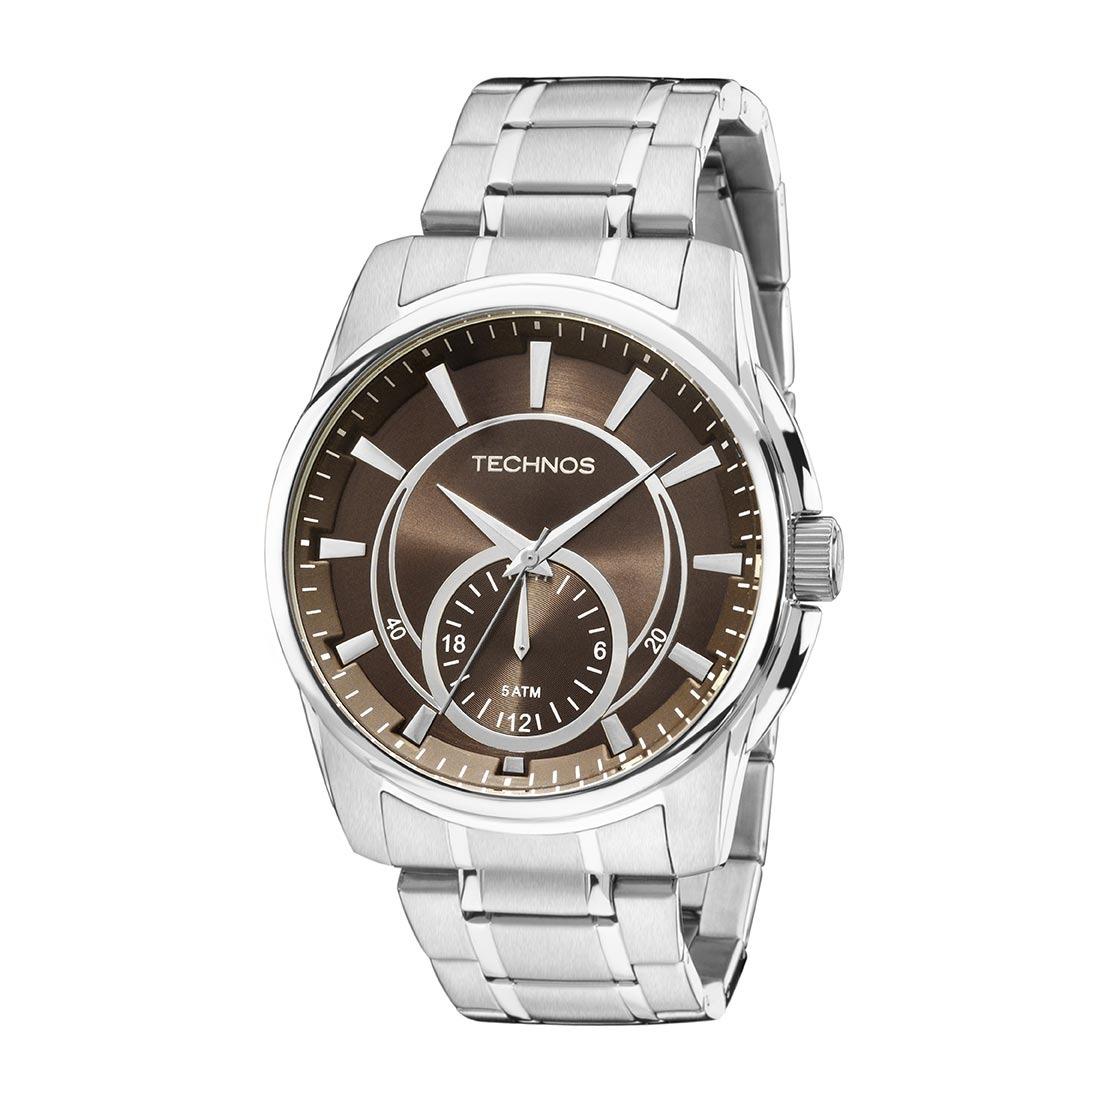 34c25f3cd11 Relógios Masculino Technos Analogico Aço - 6p28ab 1m - R  290